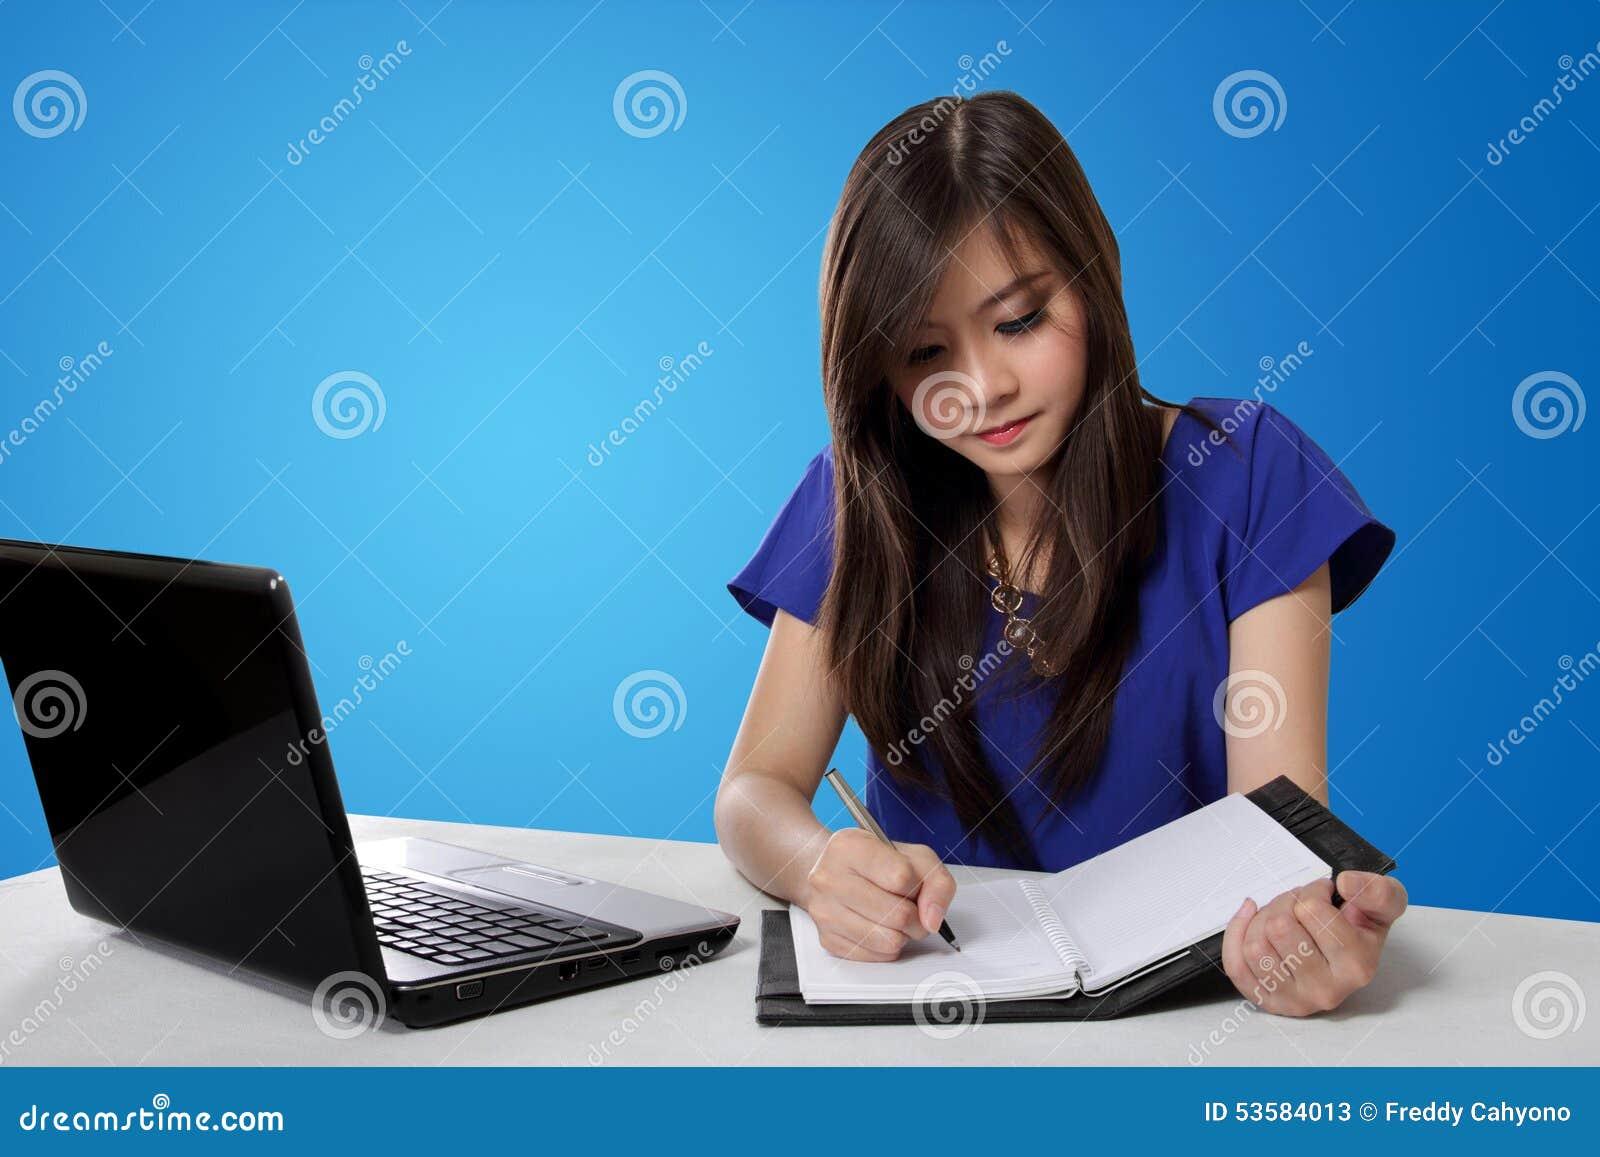 DIY Writing Desk